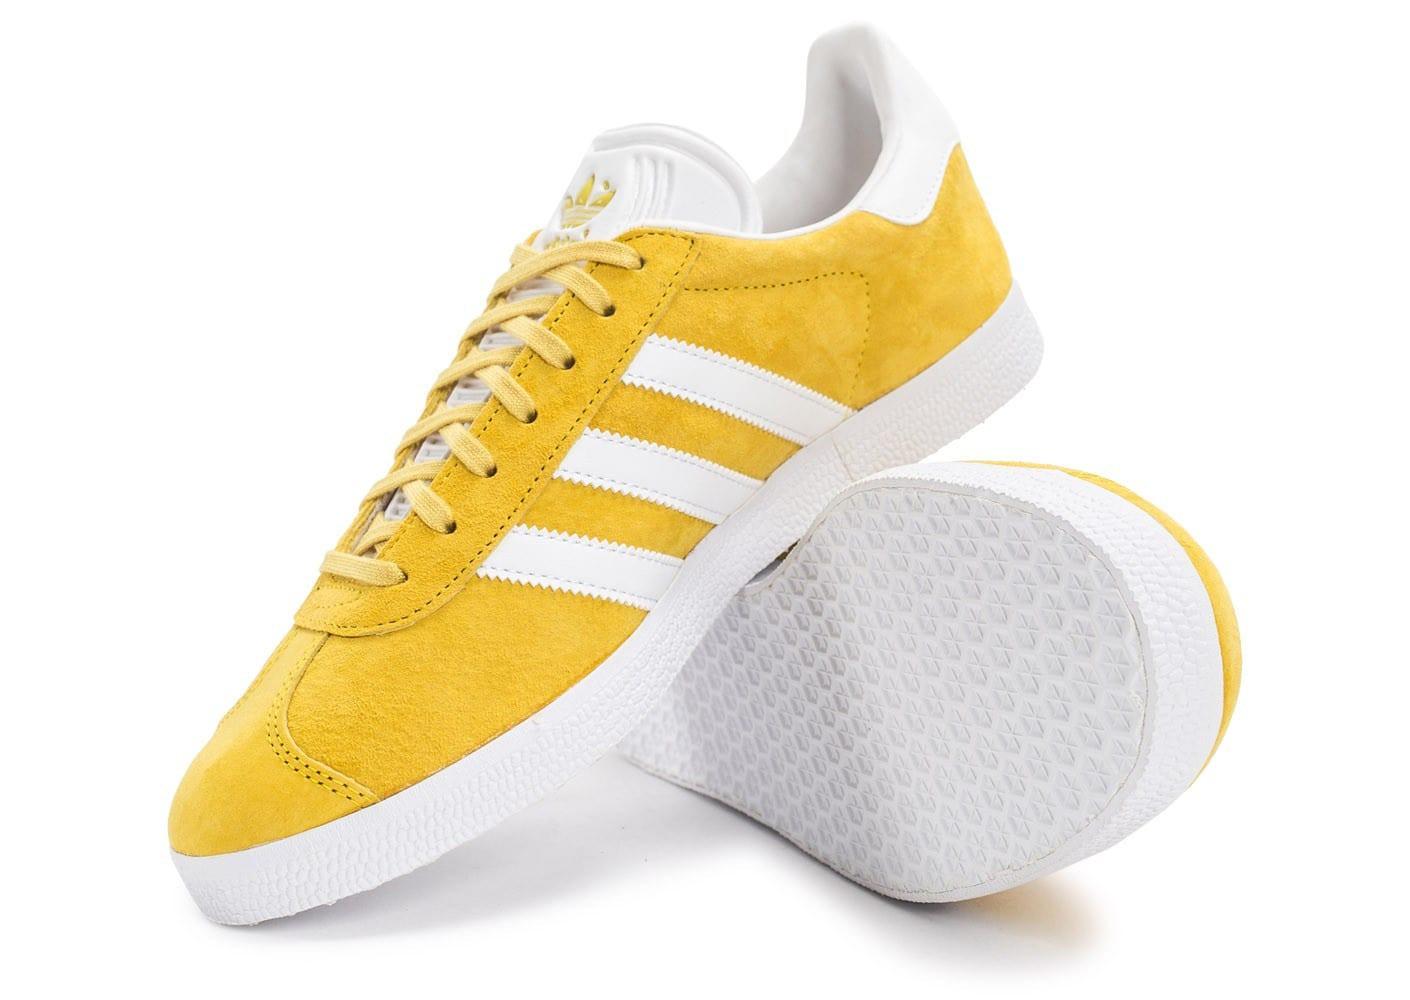 adidas gazelle homme jaune et noir